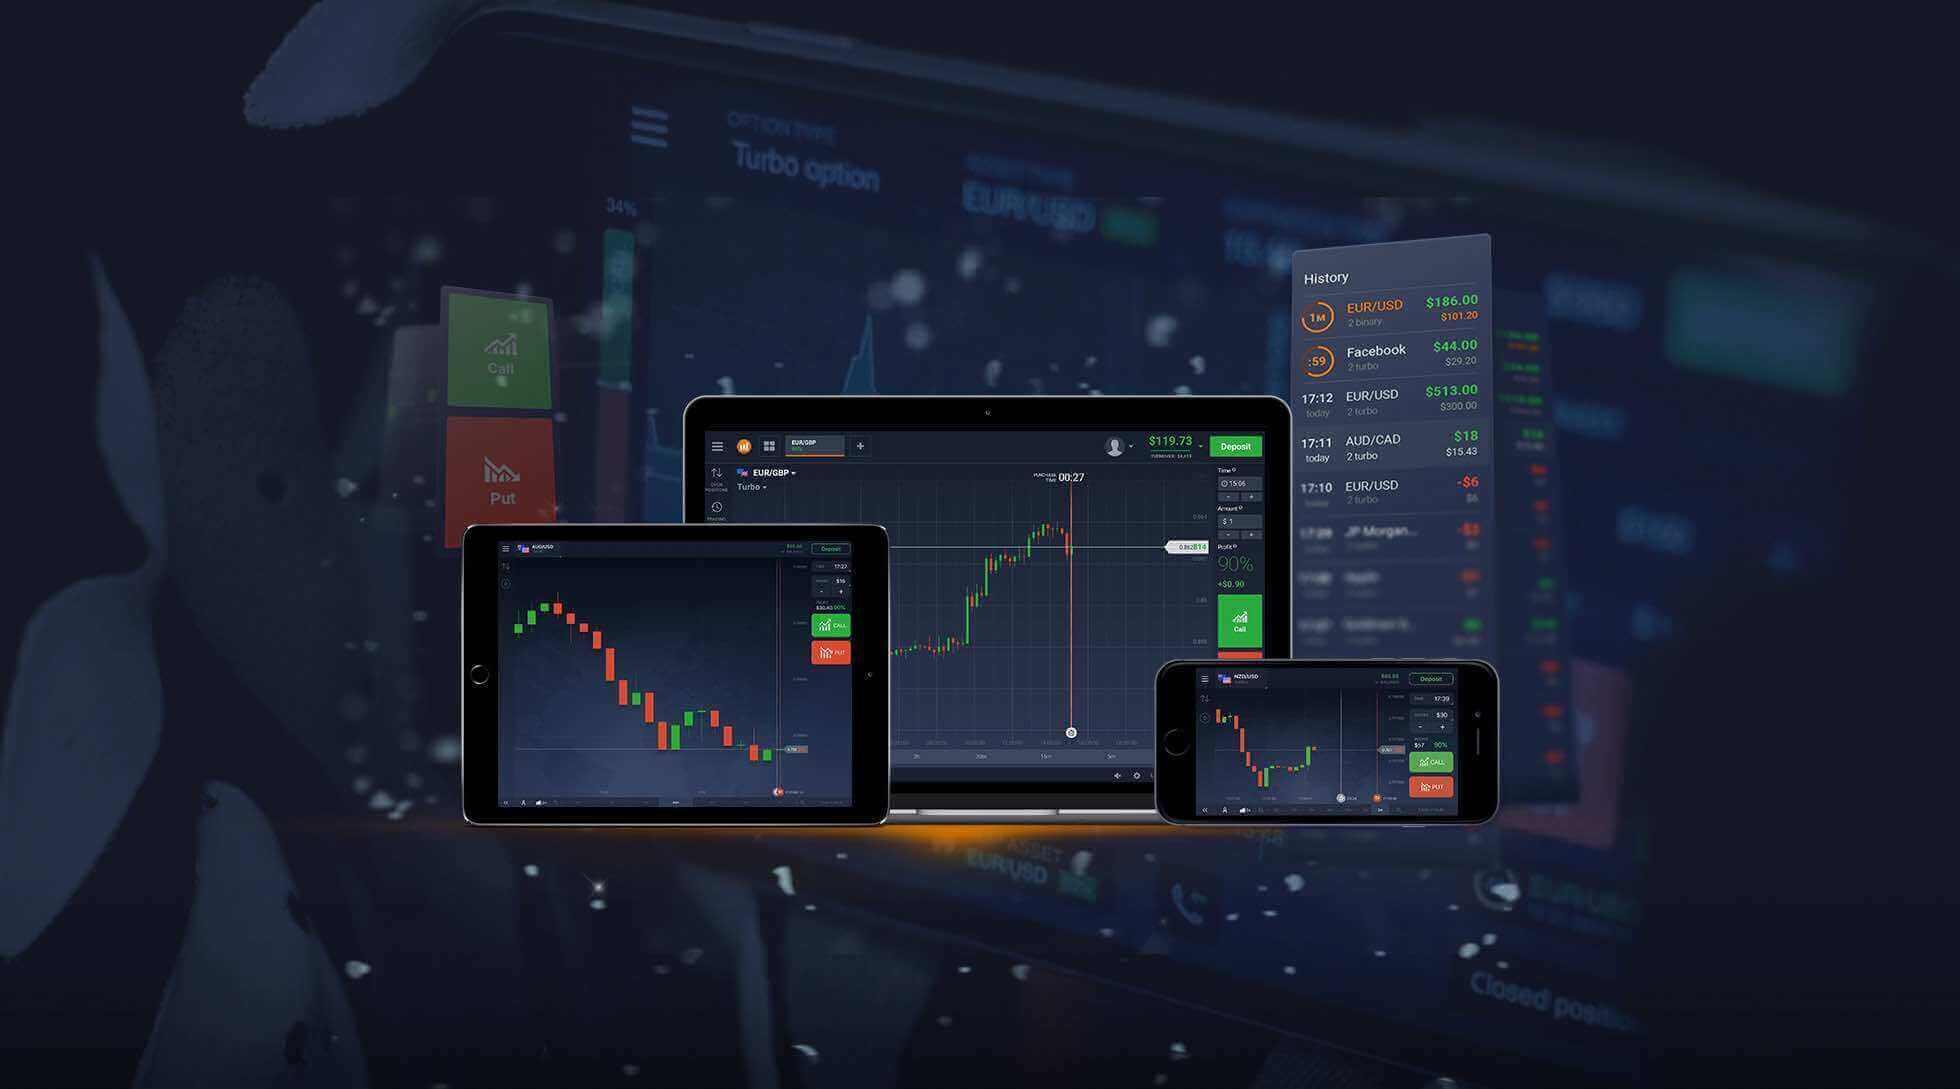 IQ trading platform